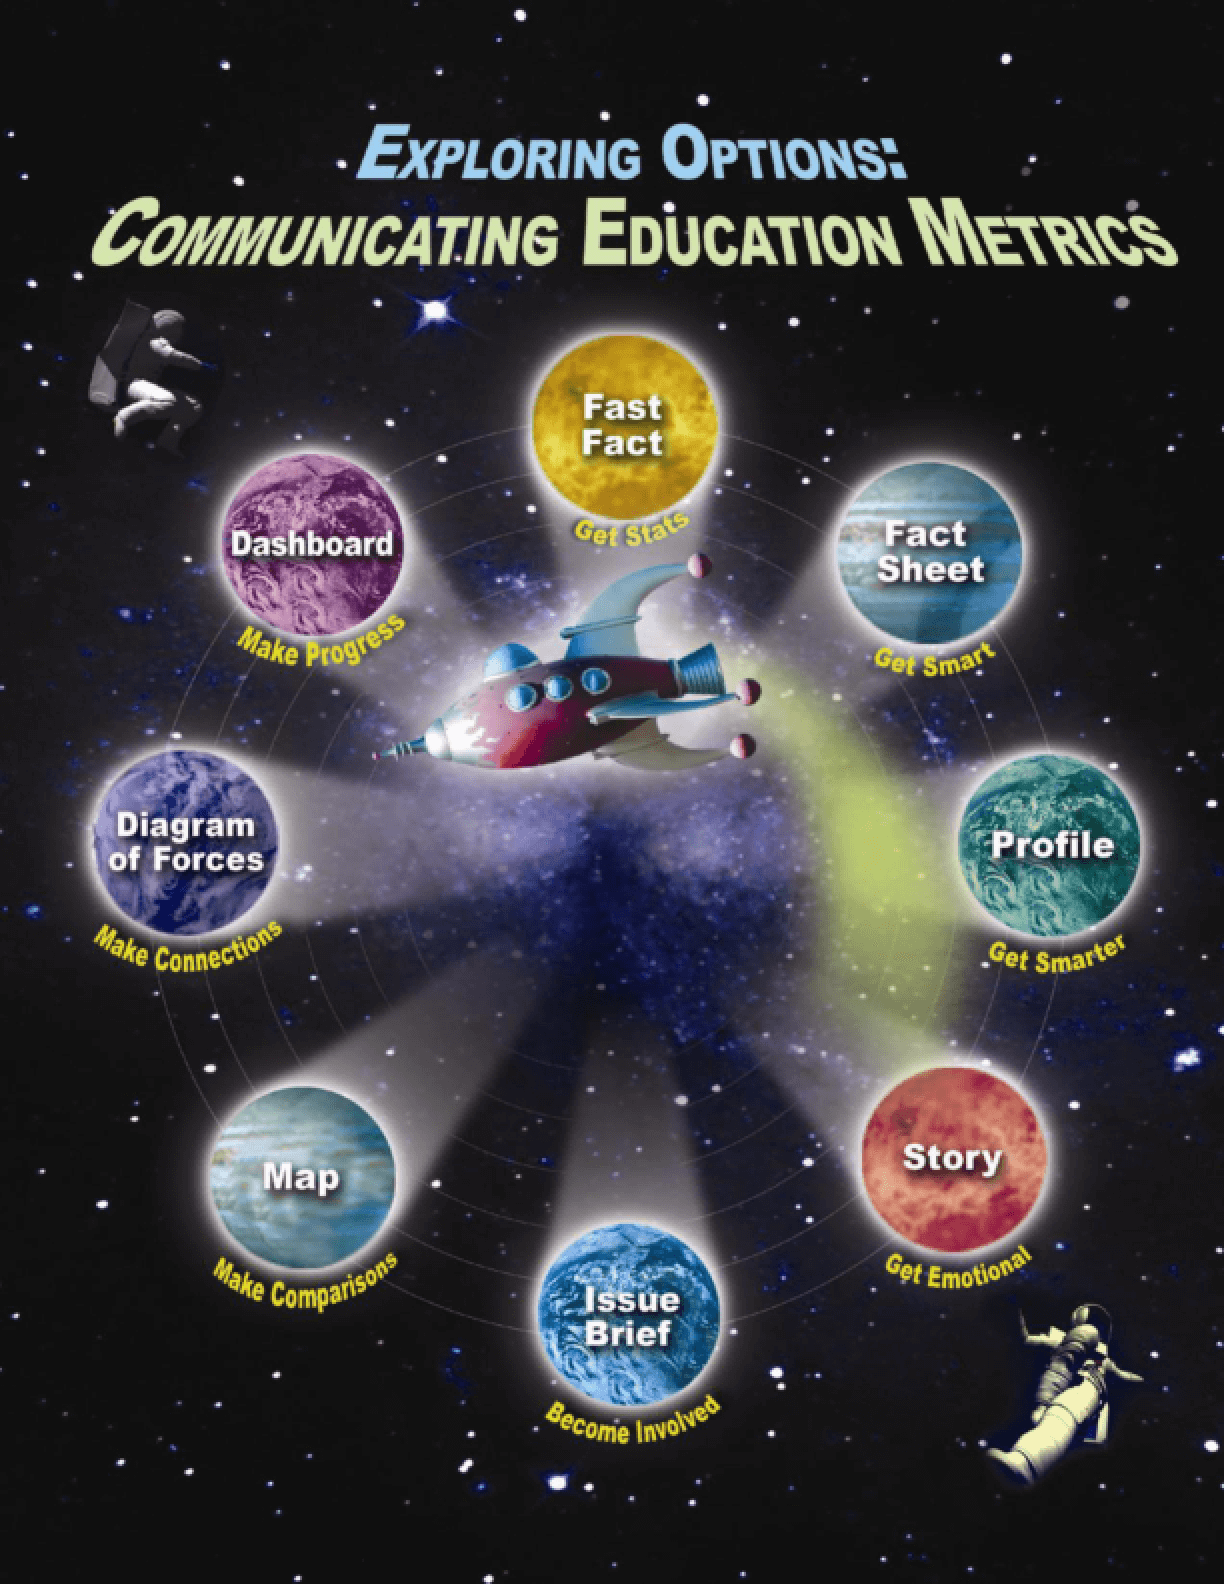 Communicating Education Metrics